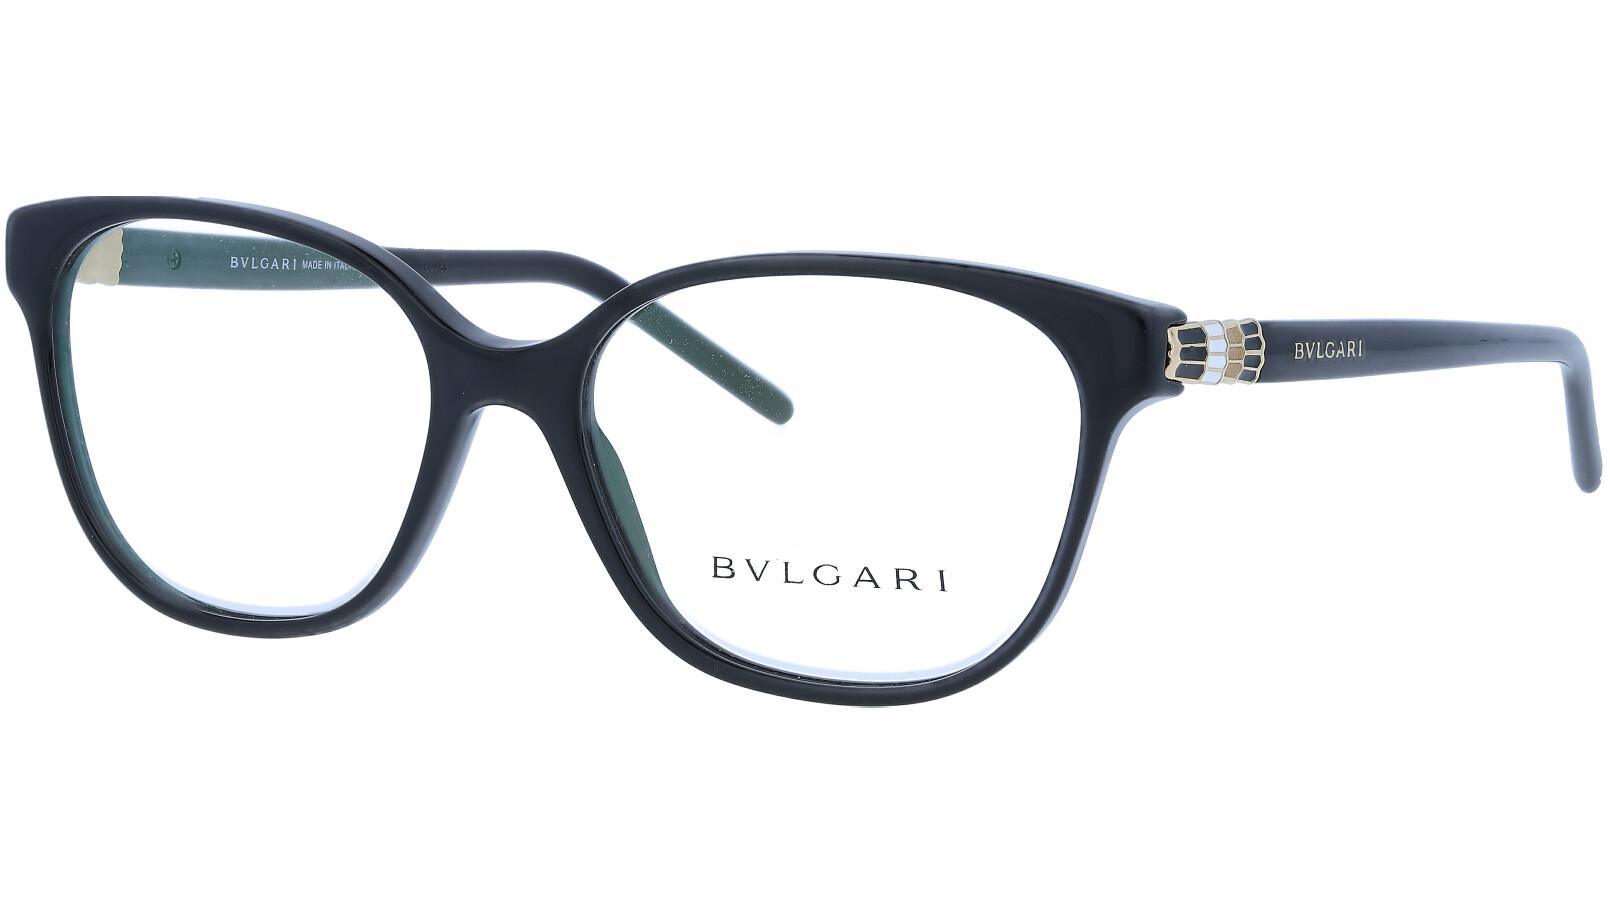 BVLGARI BV4105 501 54 BLACK Glasses